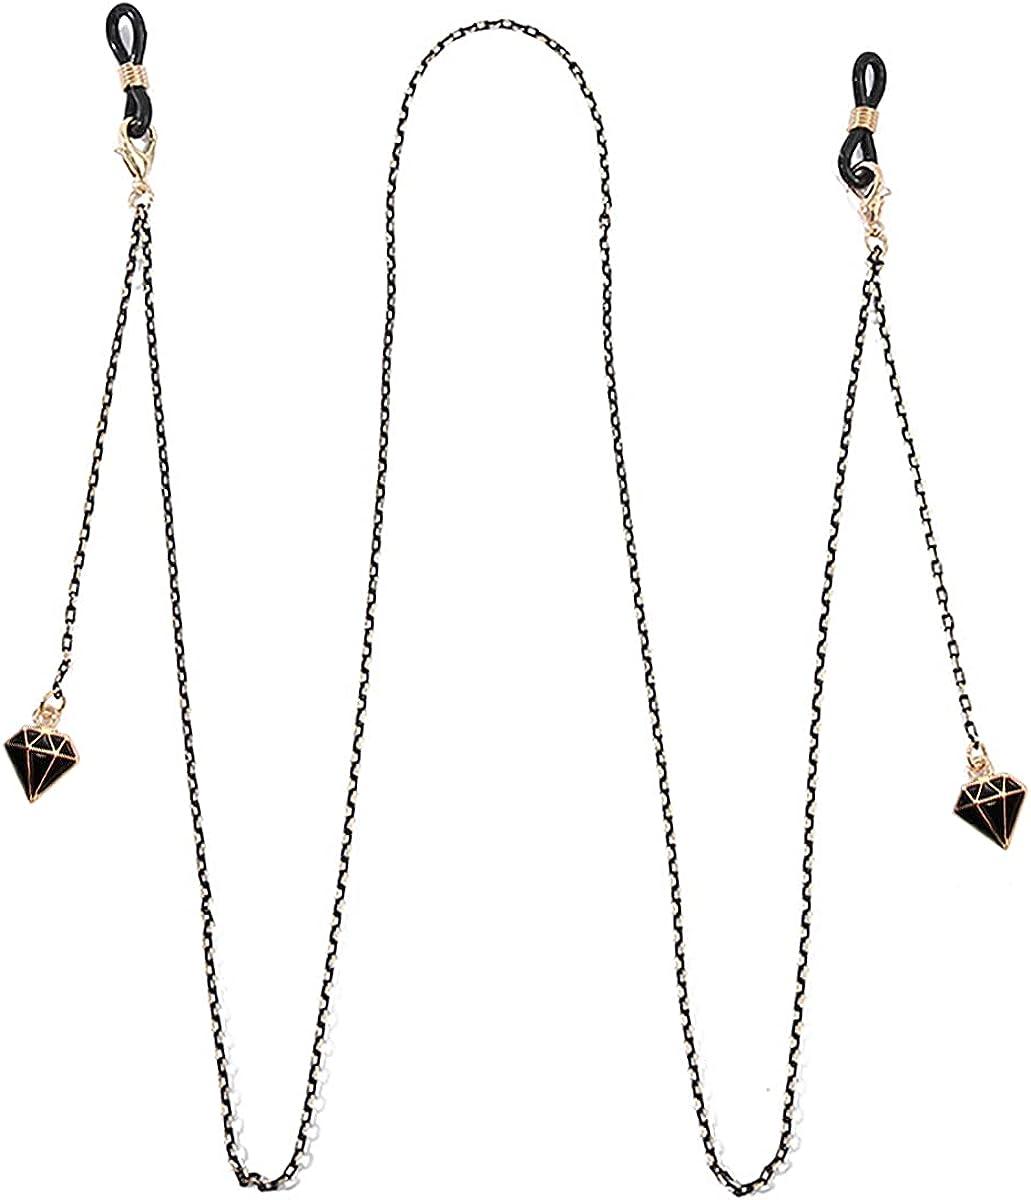 Mask Holder Chain Eyeglass Chain with Pendant, Aolaso Glasses Chain Mask Lanyard